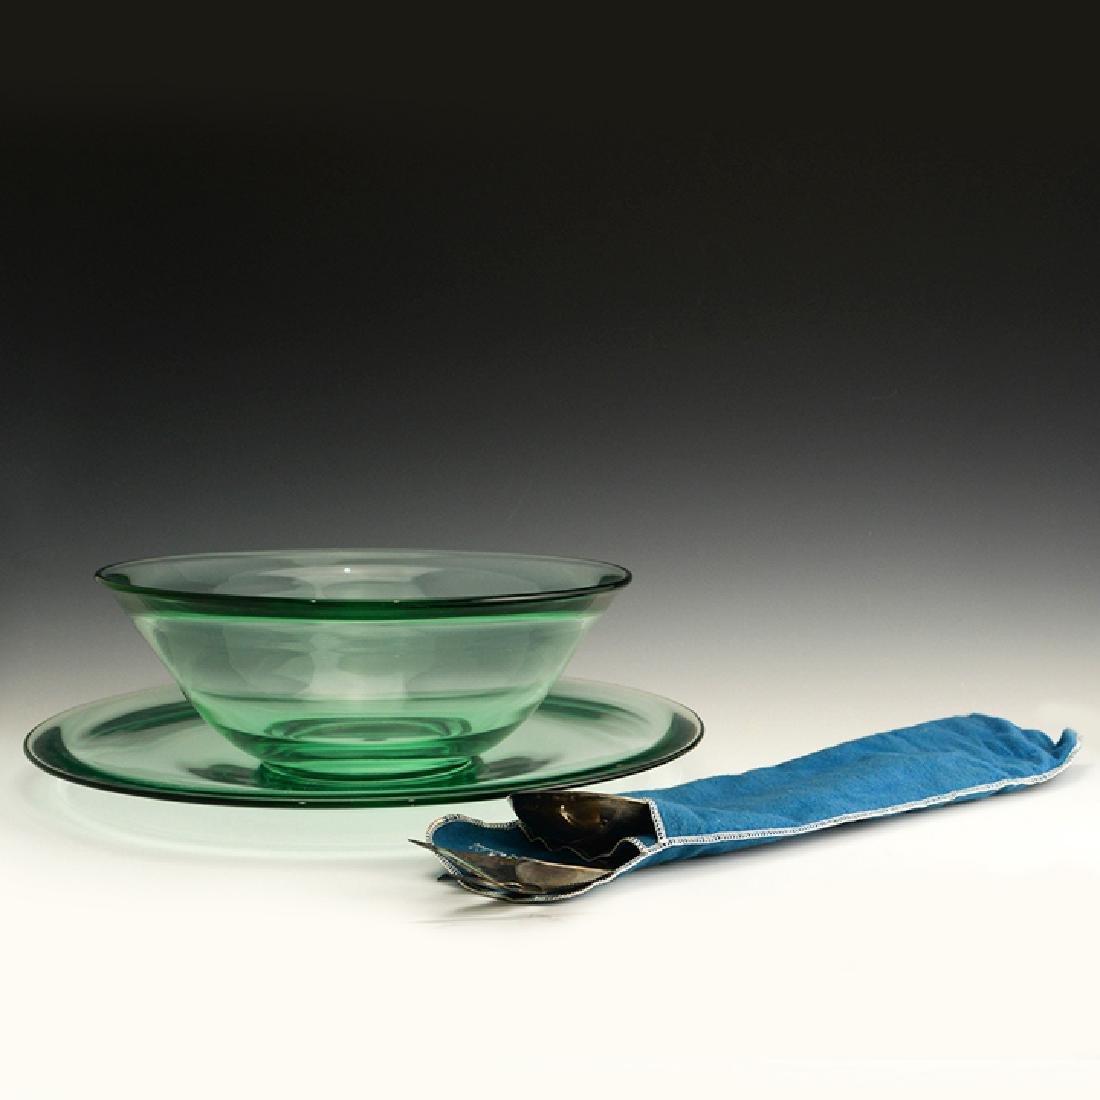 Very Rare Zeisel Heisey Glass Salad Set, original box